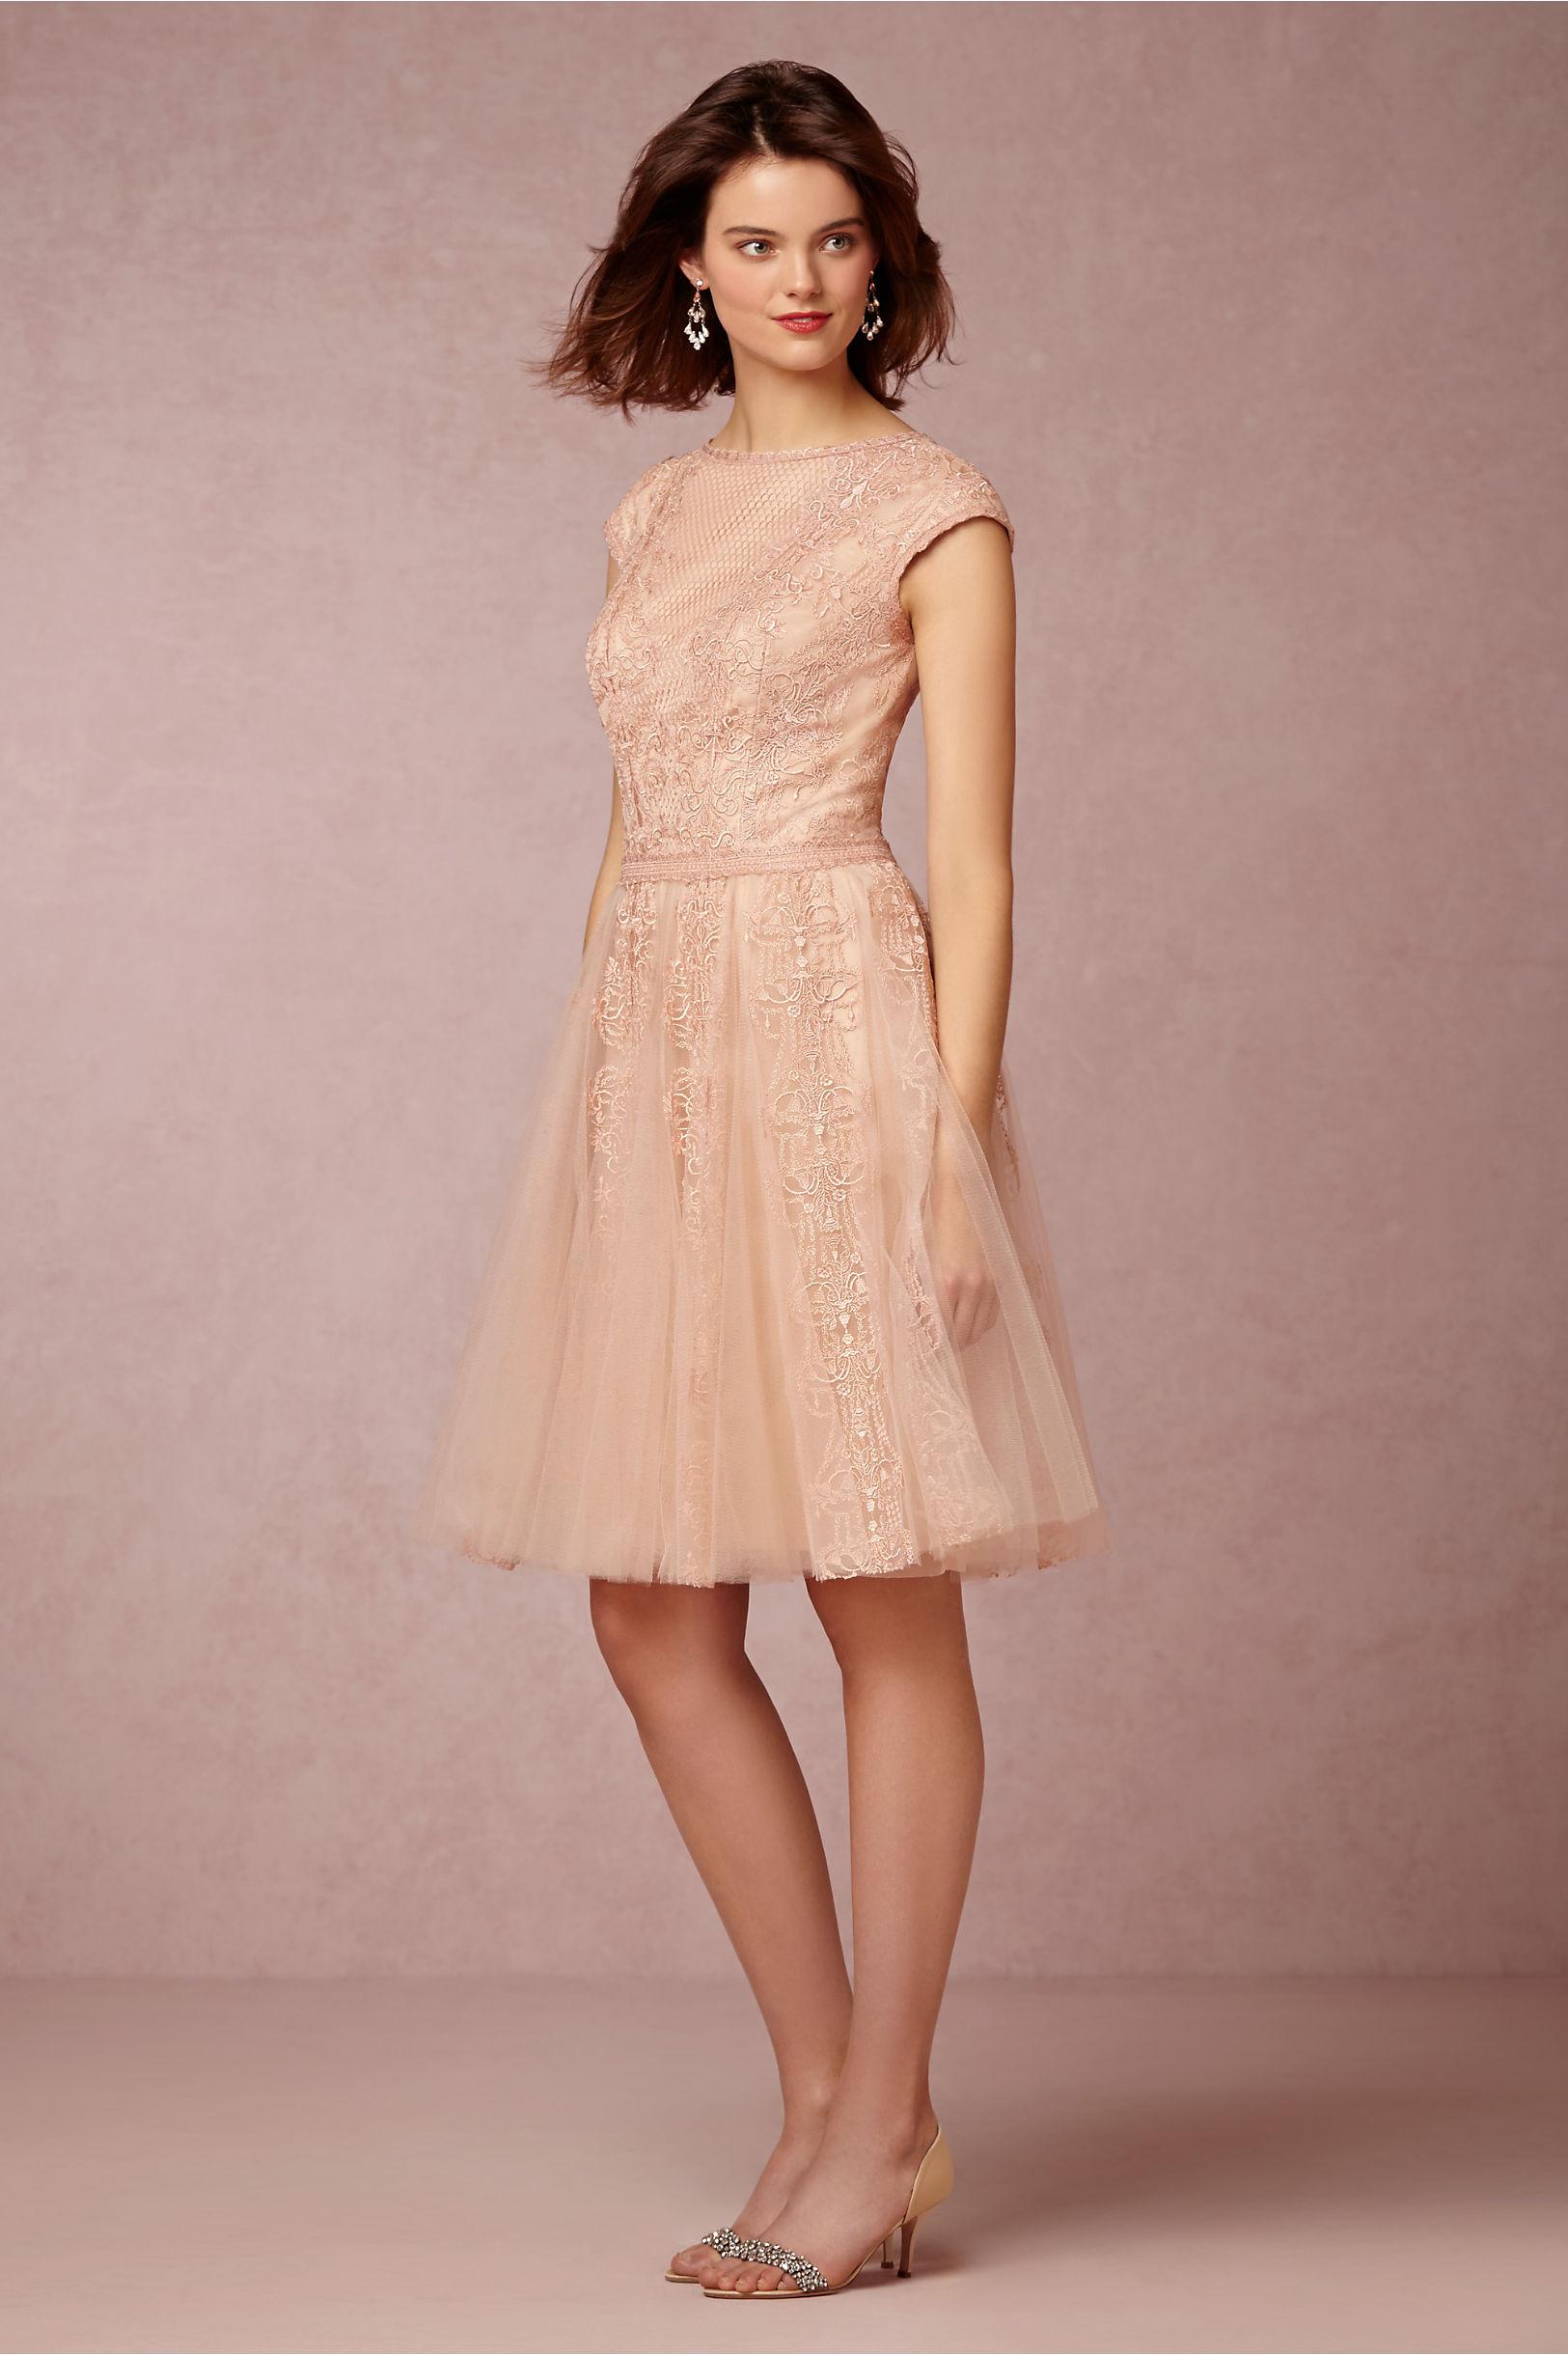 Tadashi Collection Spring 2018 Dress Blush